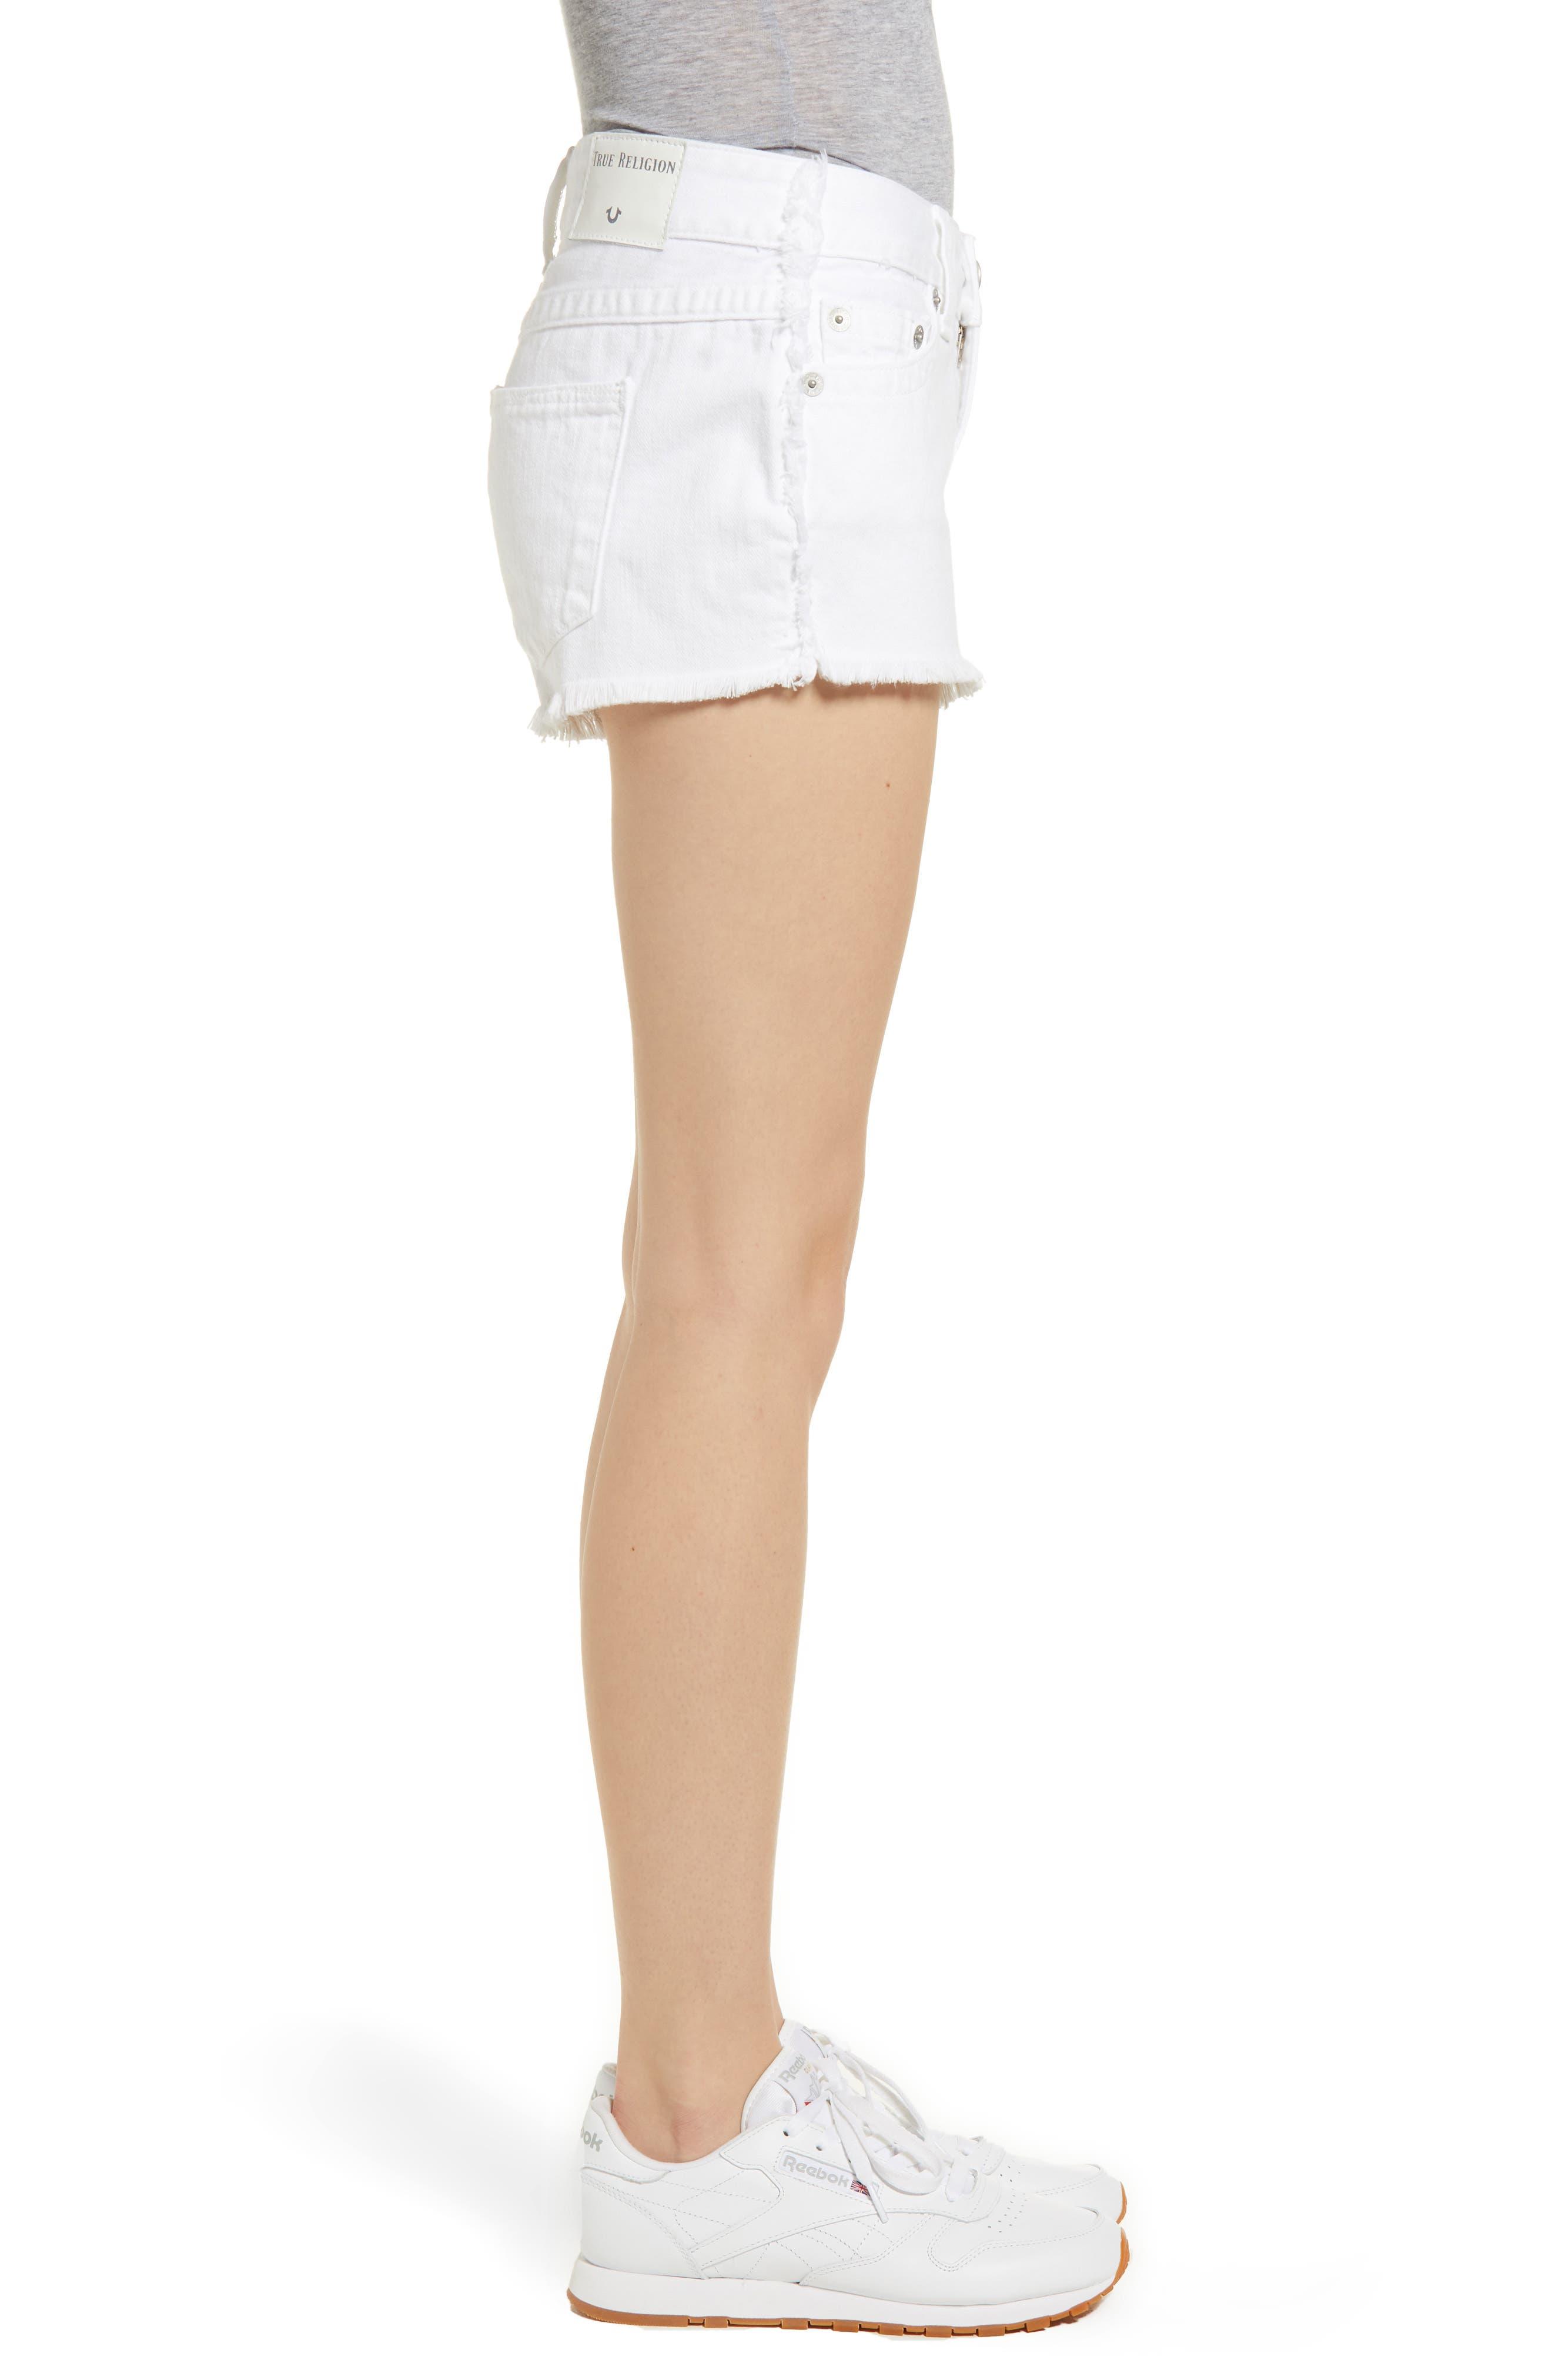 Kieras Cutoff Denim Shorts,                             Alternate thumbnail 3, color,                             Eucd Optic White